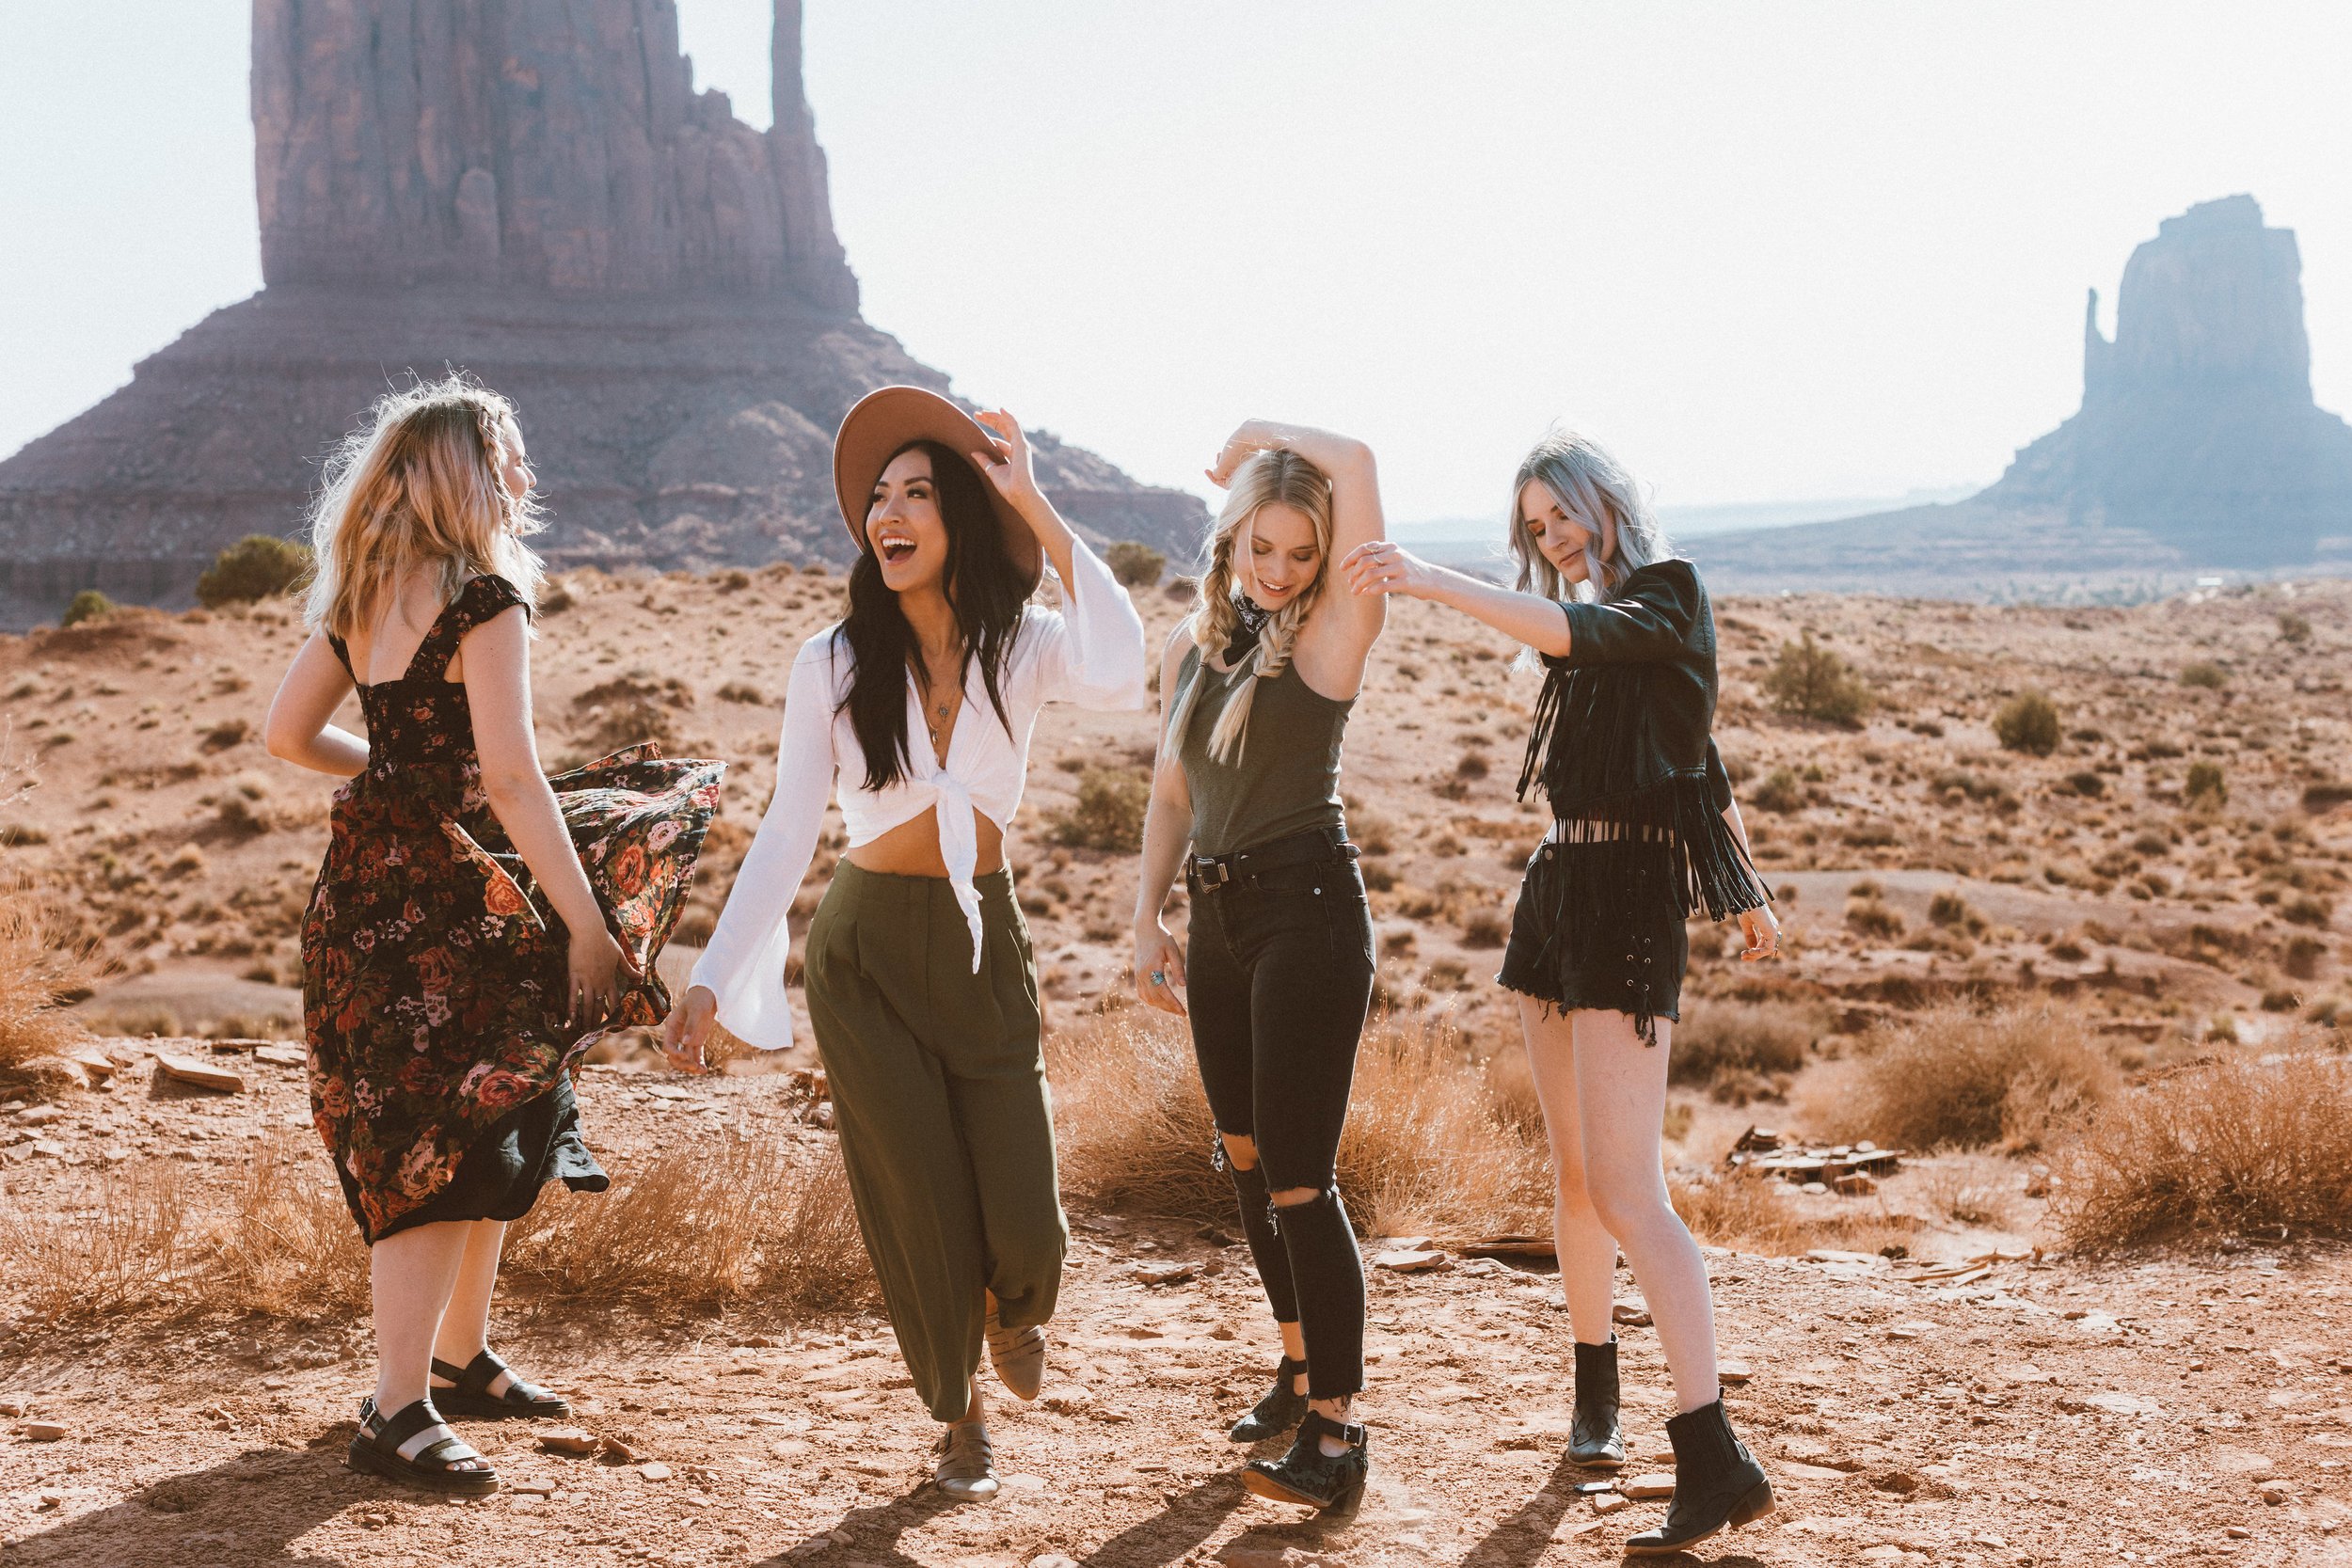 Monument Valley  Photographer: Ashley Jensen  Models: Abigail Hill, Jiajing Yi, Marissa Stagg, Ashley Jensen  Hair, Makeup & Wardrobe: Abigail Hill